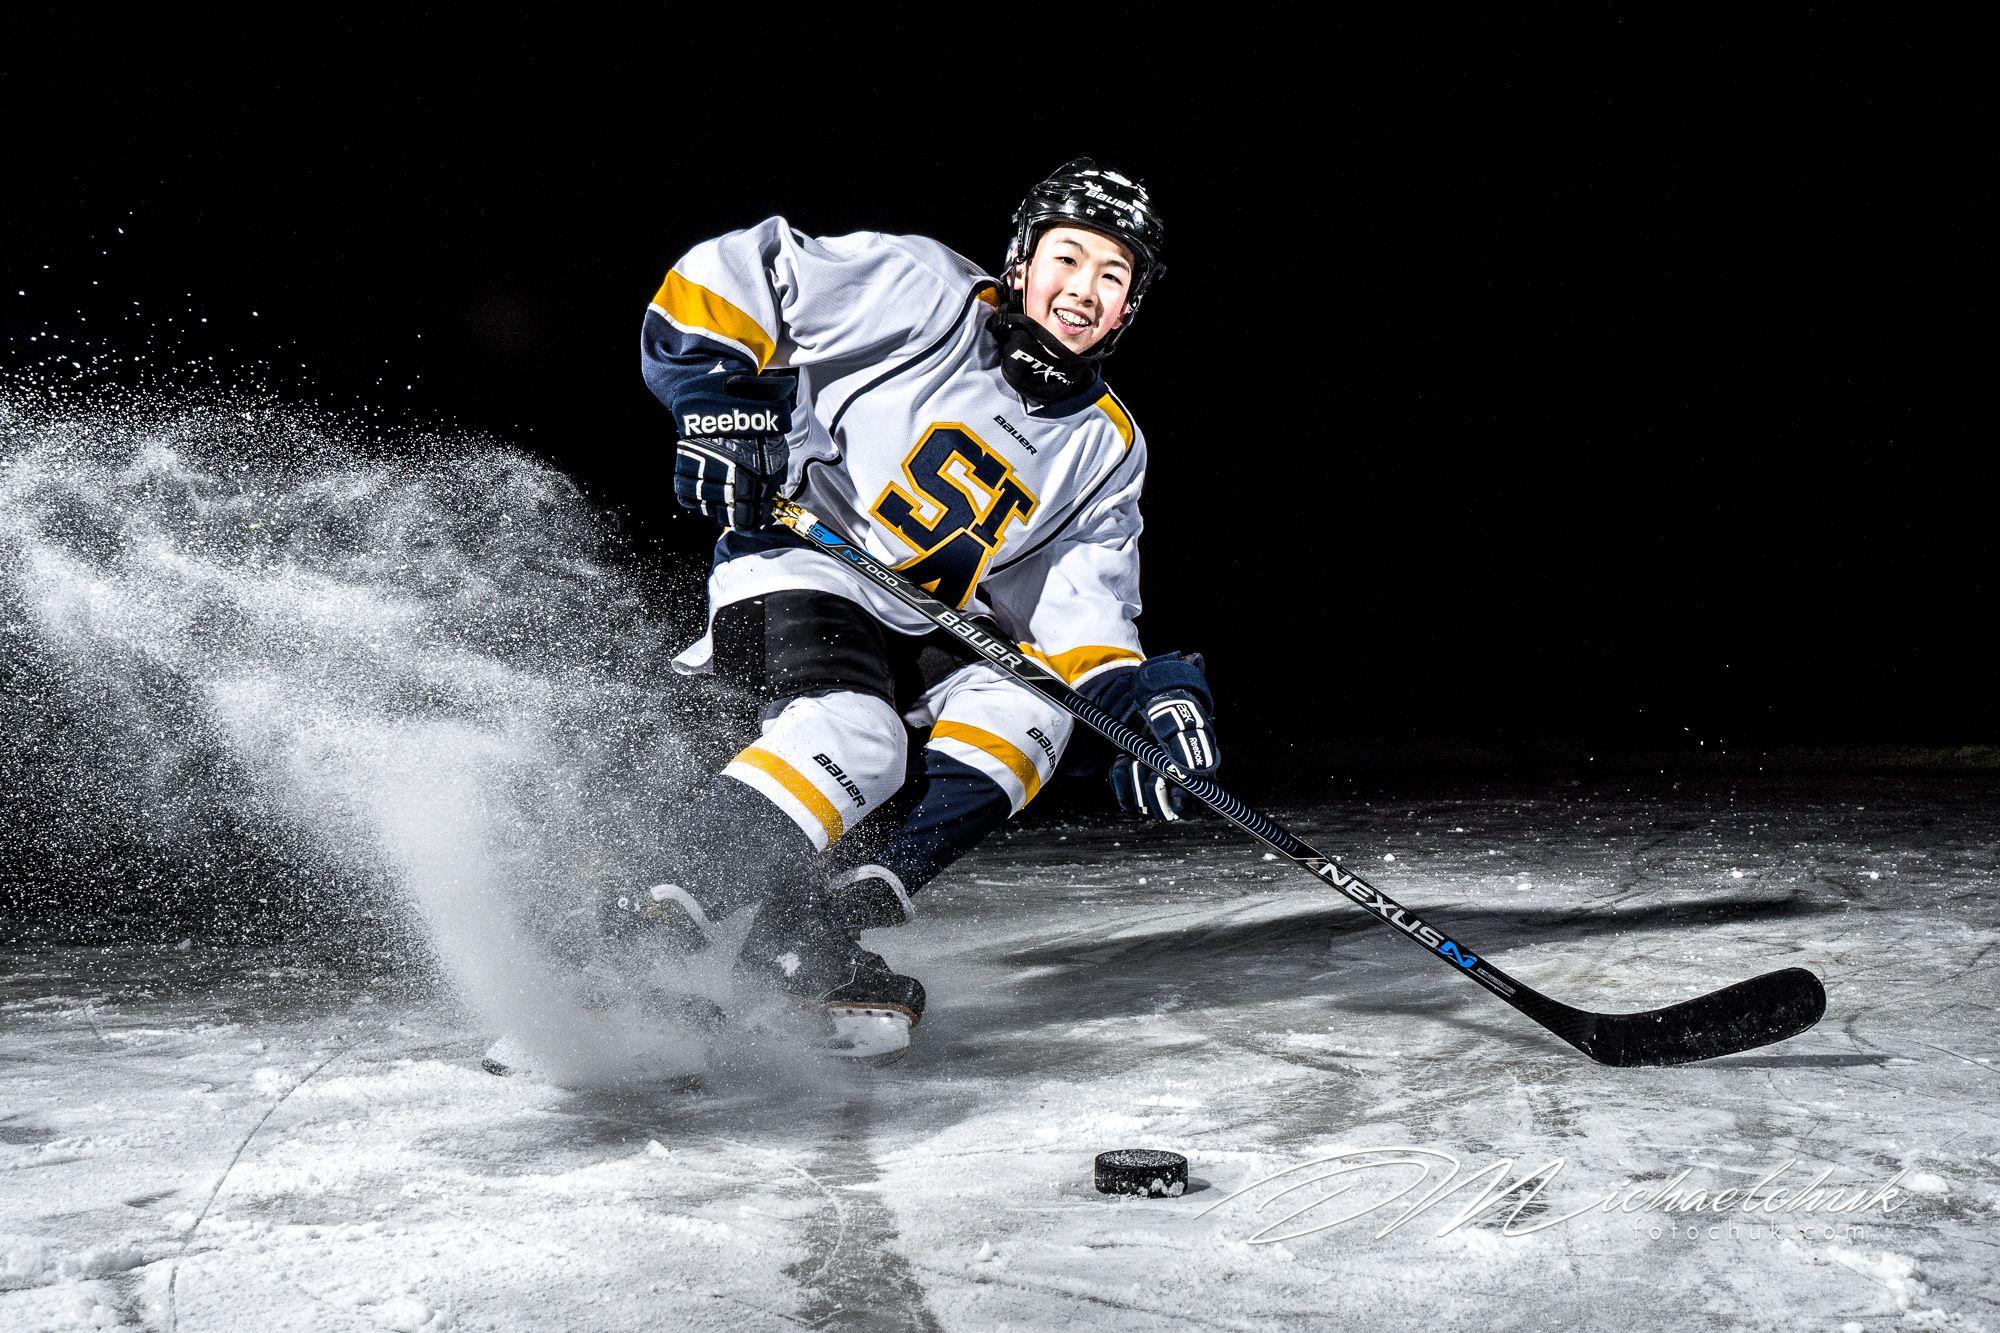 Edgy Hockey Shots Photography By Darcy Michaelchuk Hockey Shot Youth Sports Hockey